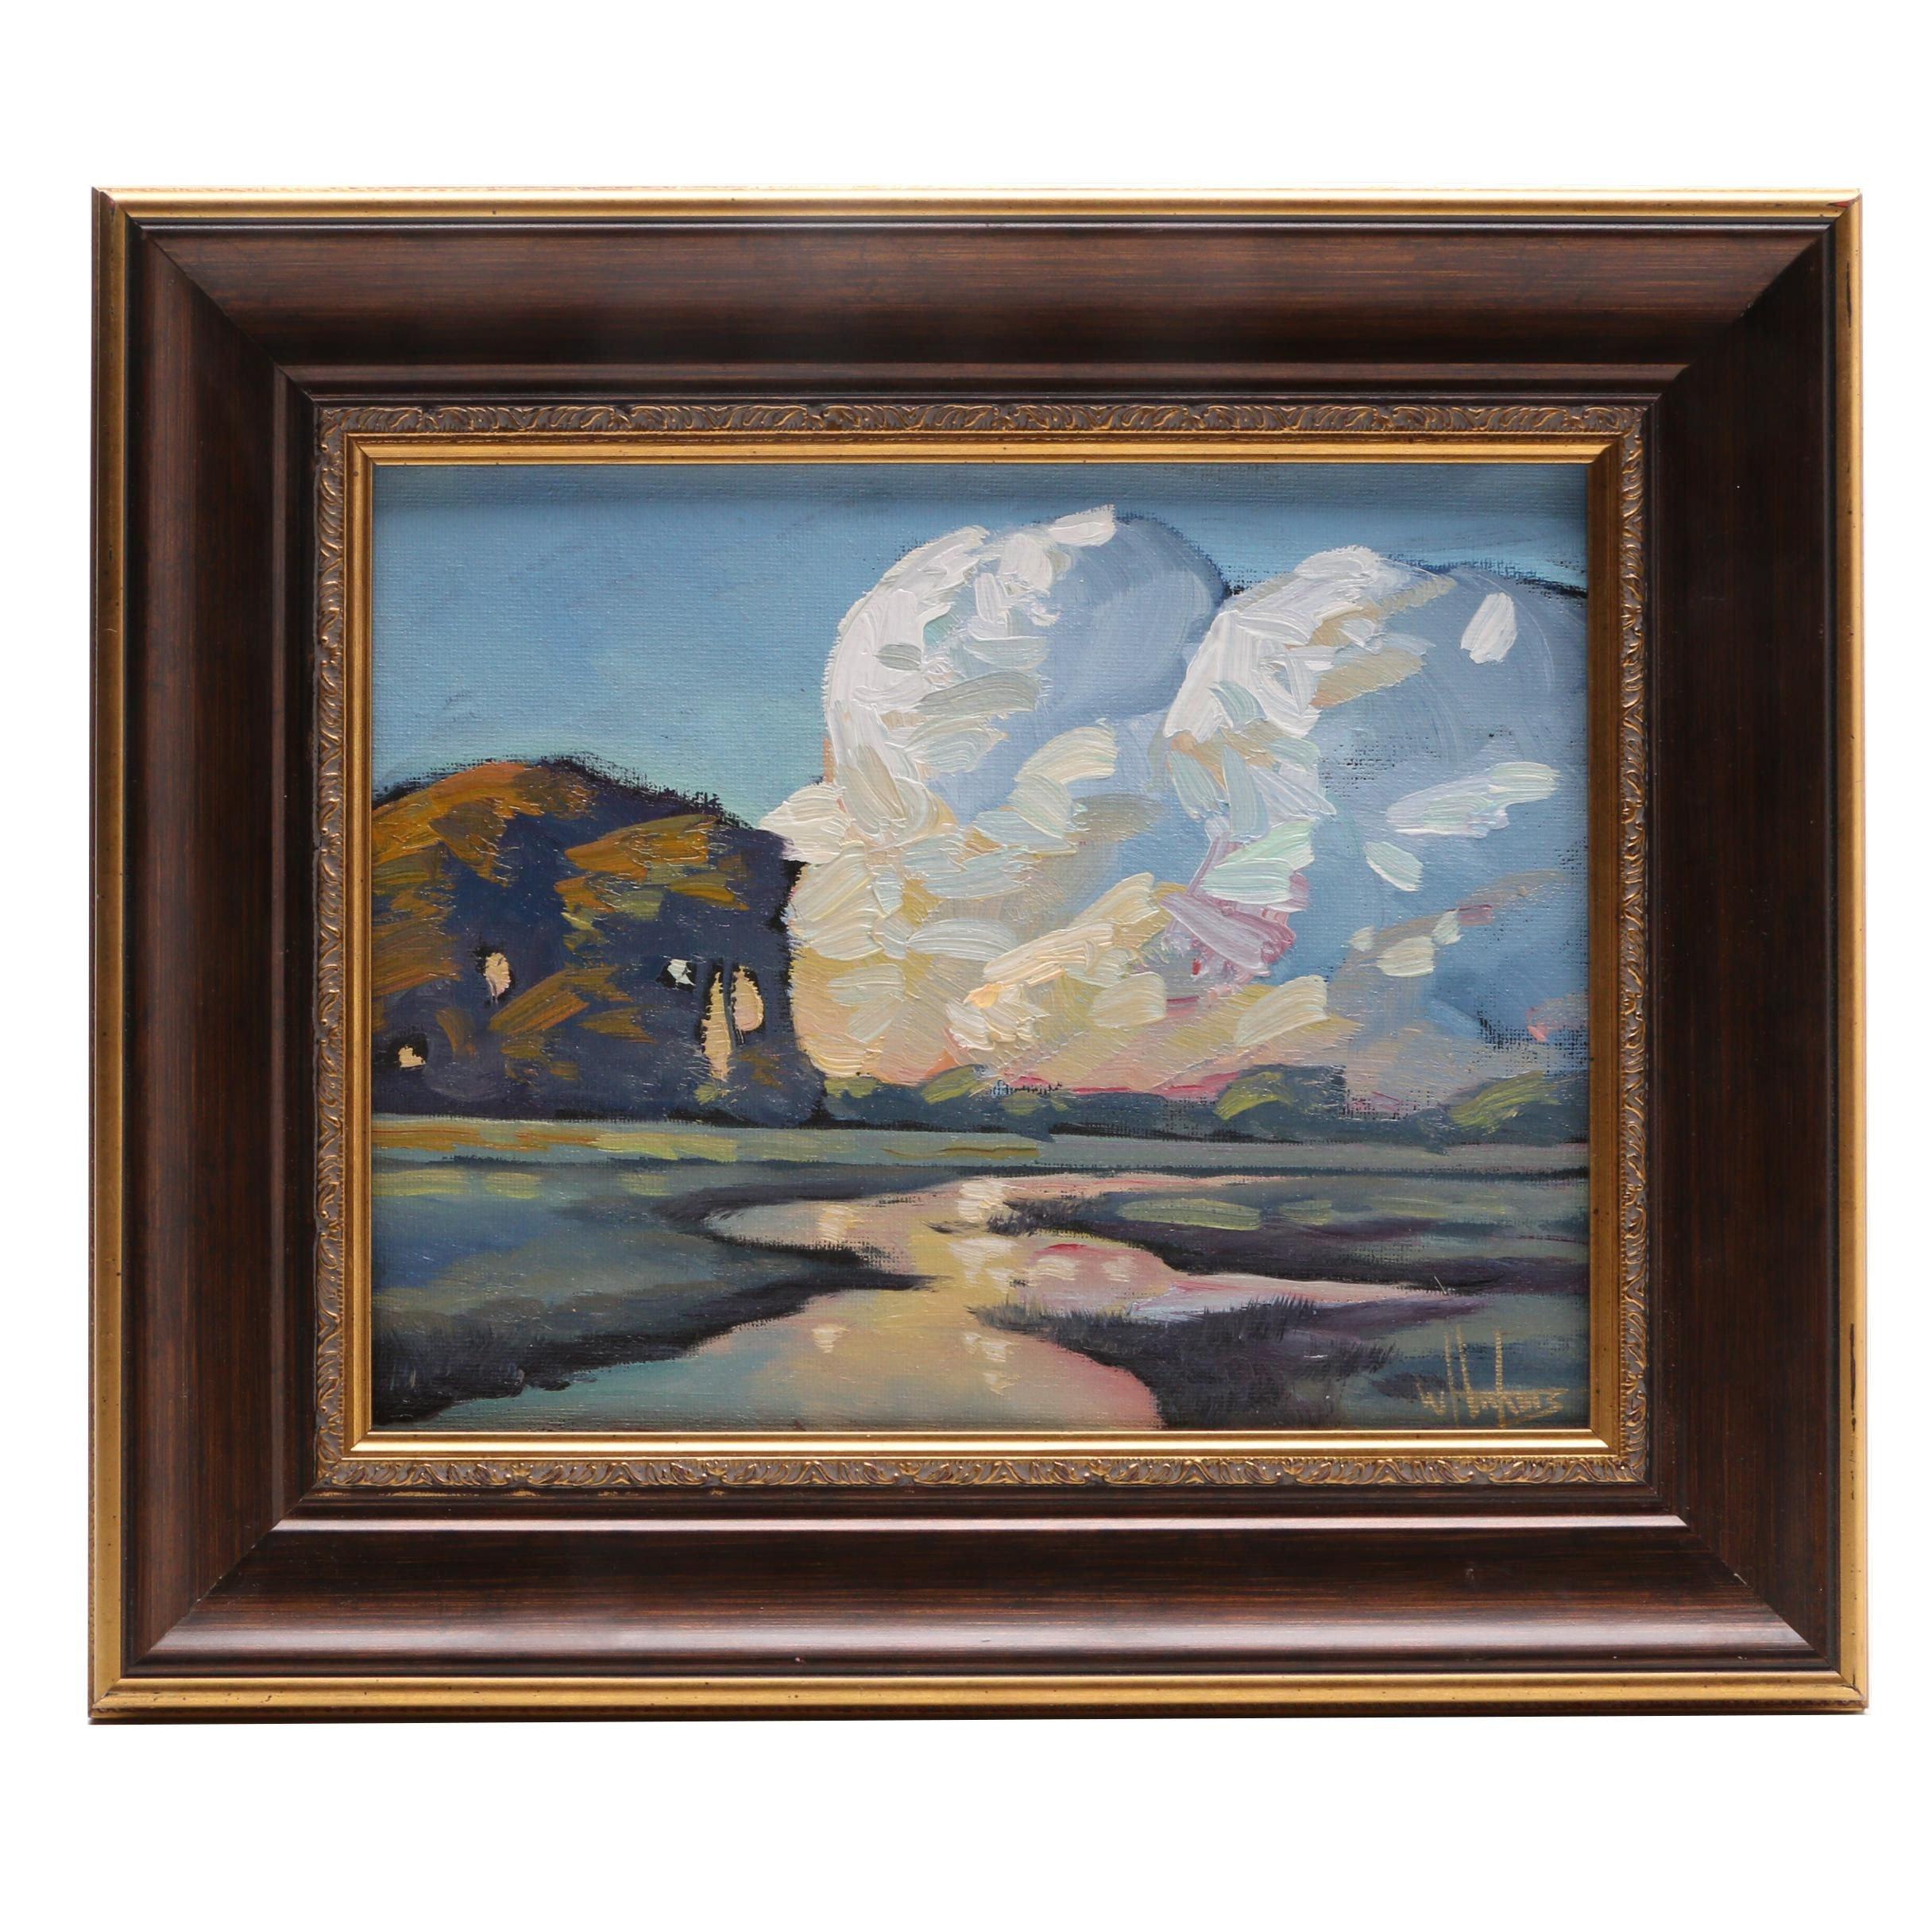 William Hawkins Oil Painting